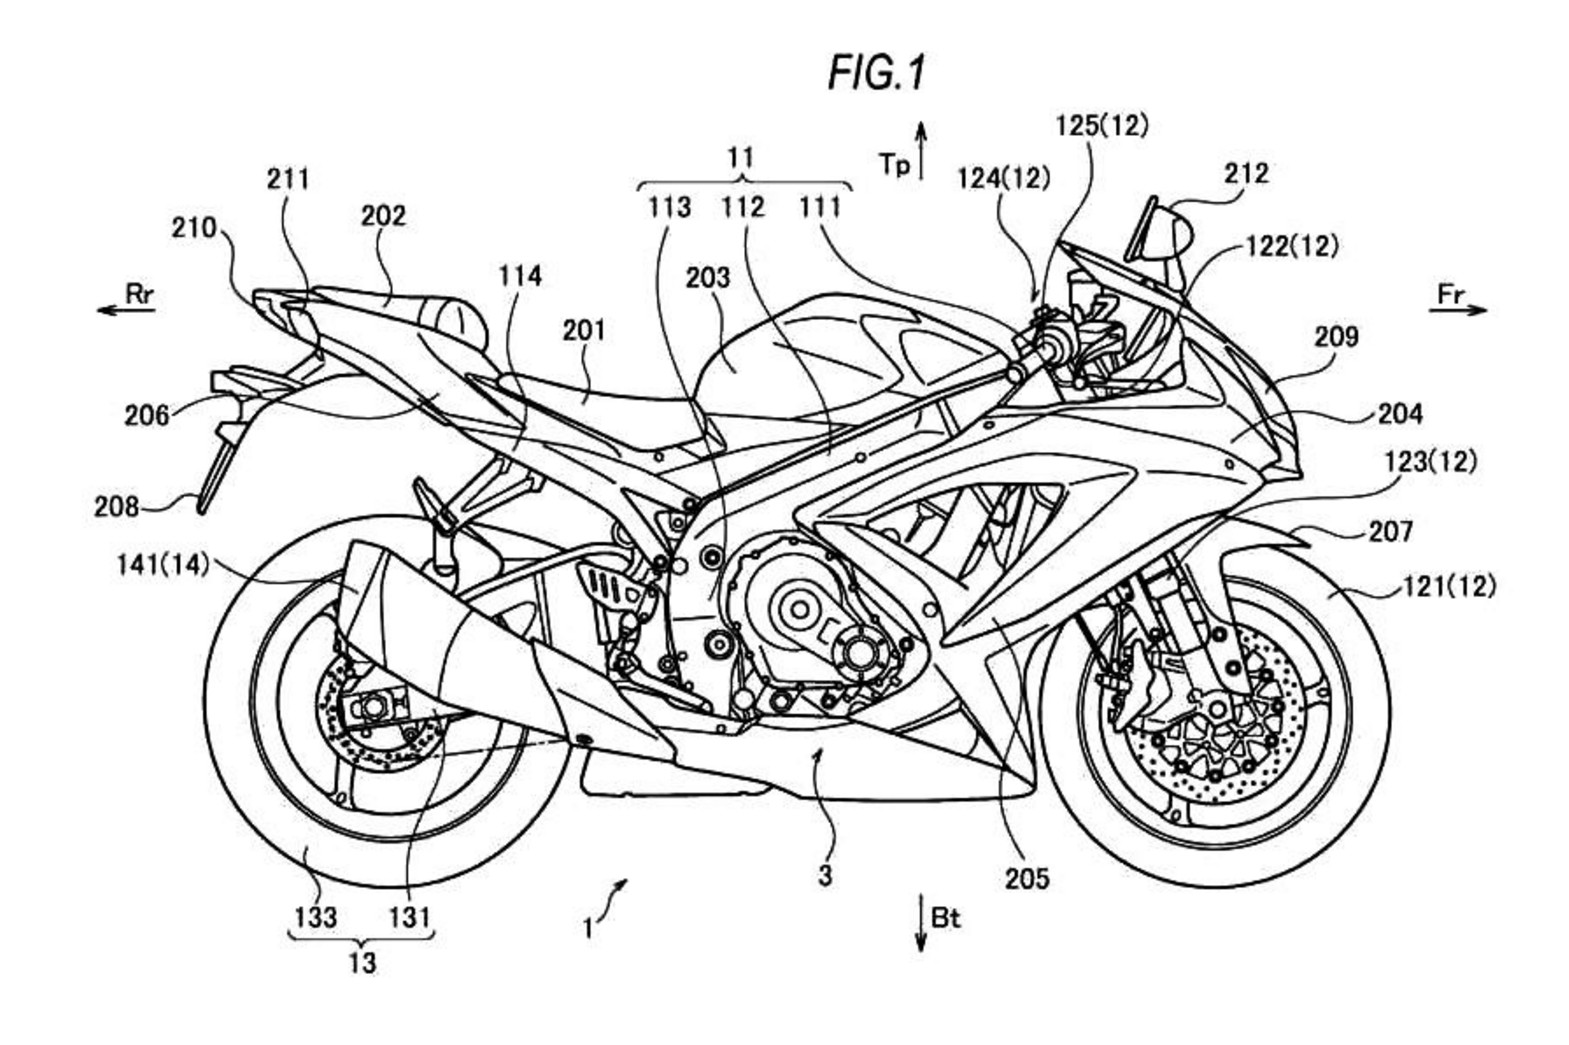 suzuki rumored to add turbocharging to its gsx